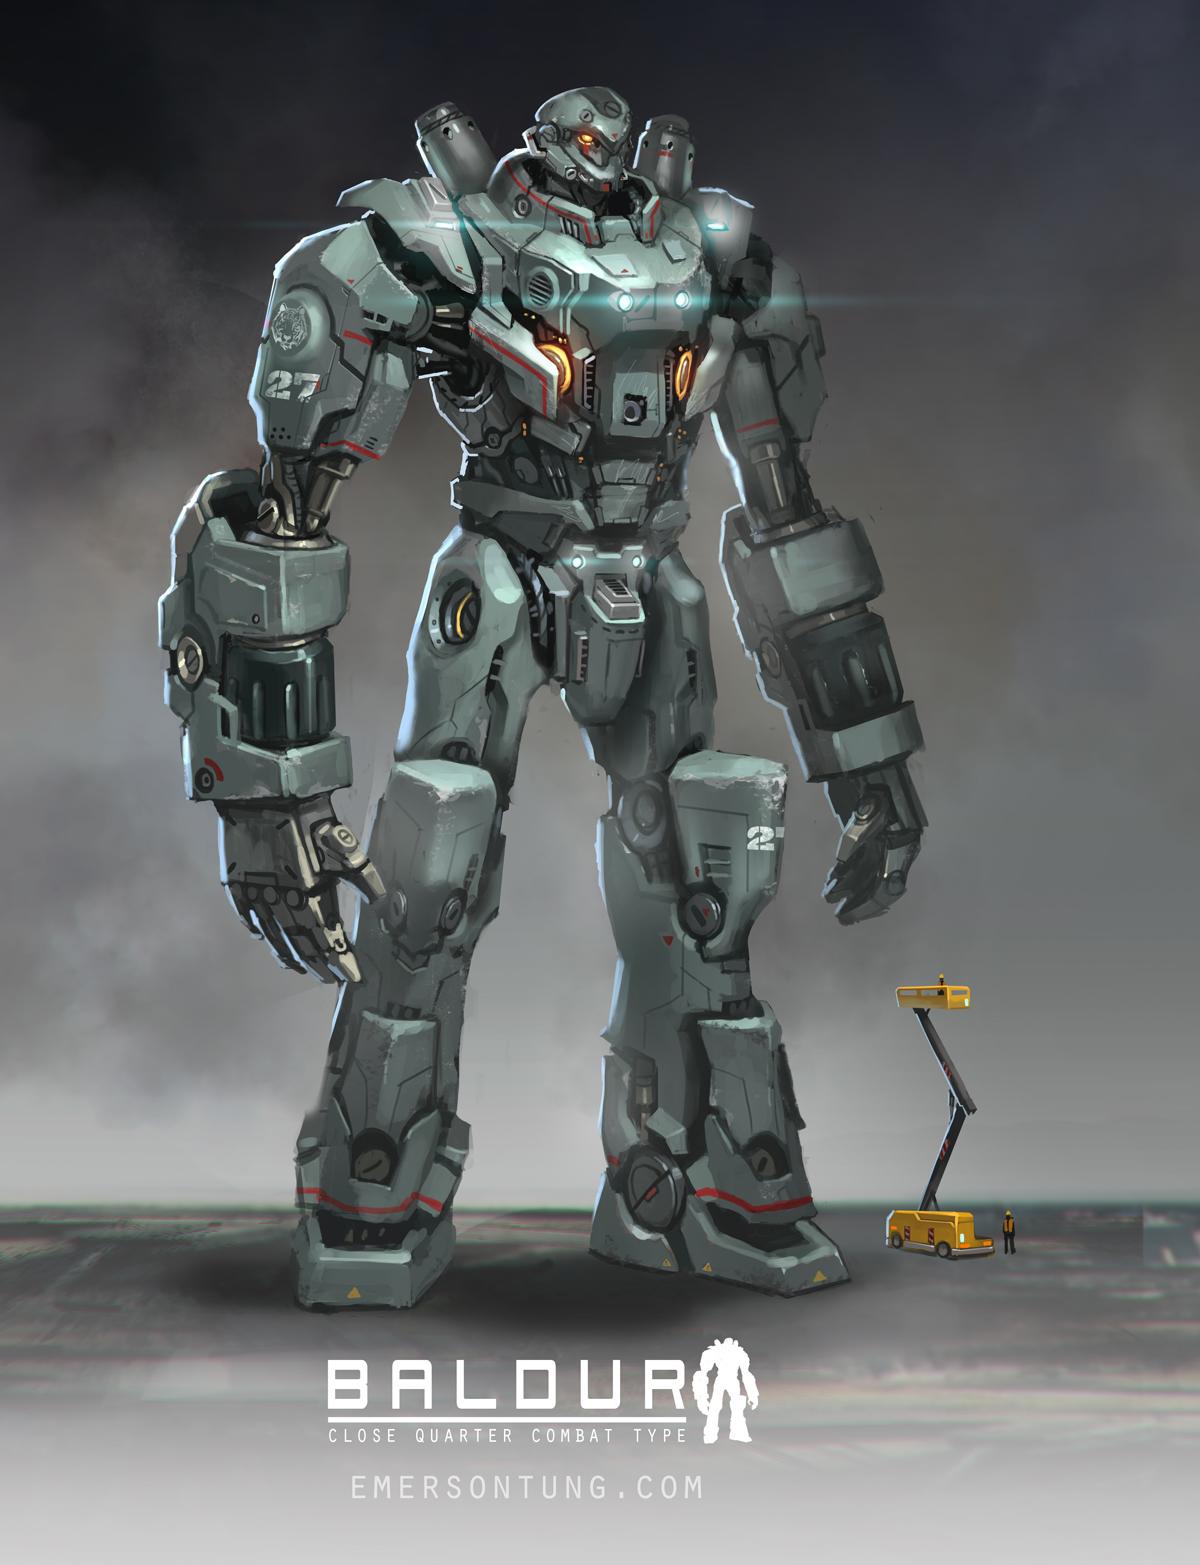 robothead-fullbody_2 copy